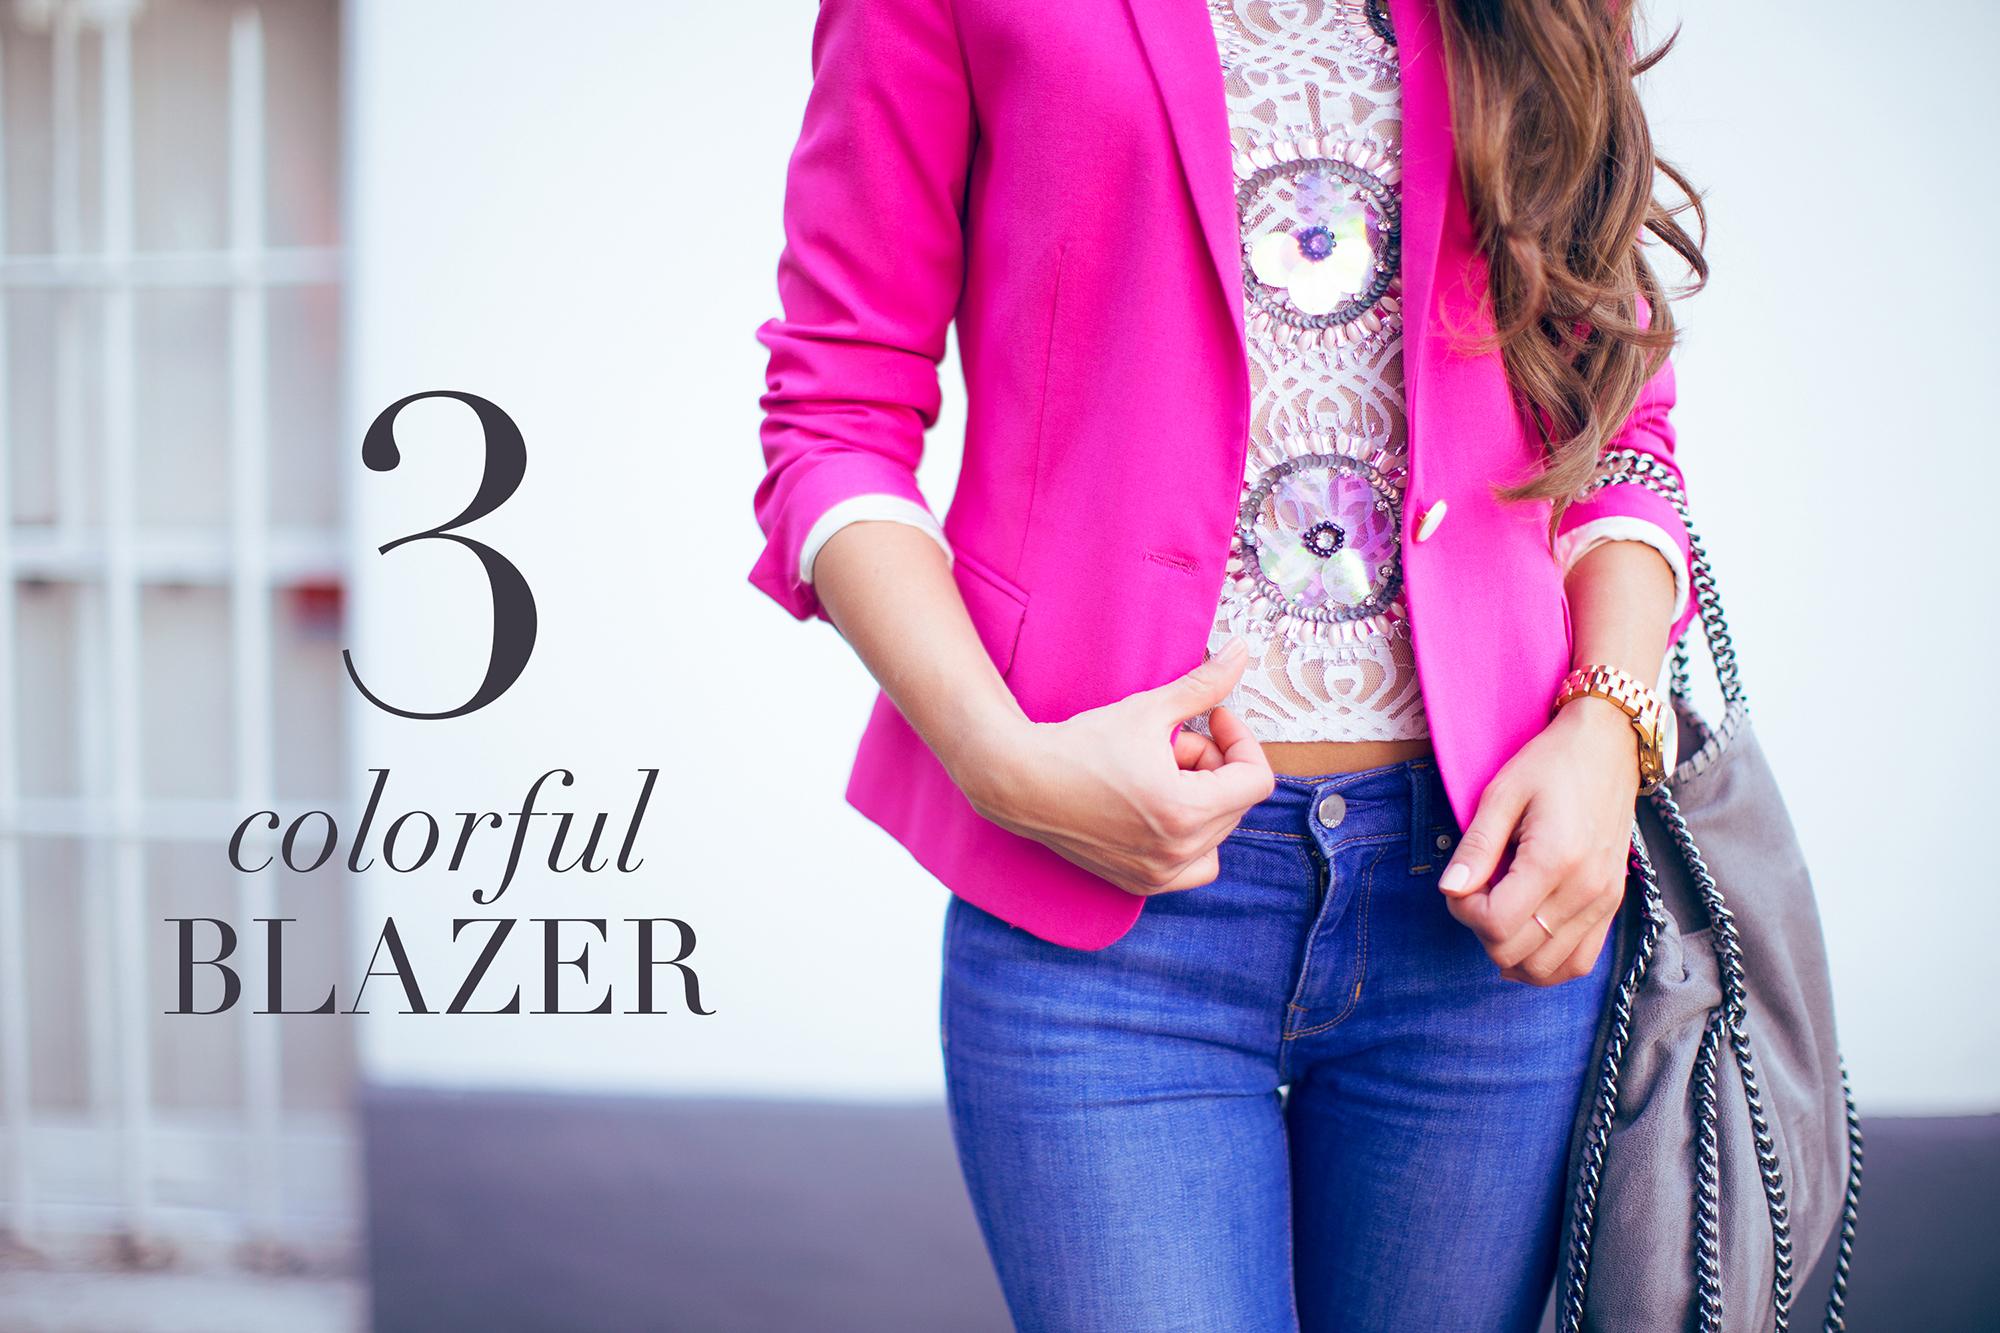 colorfulblazer2.jpg